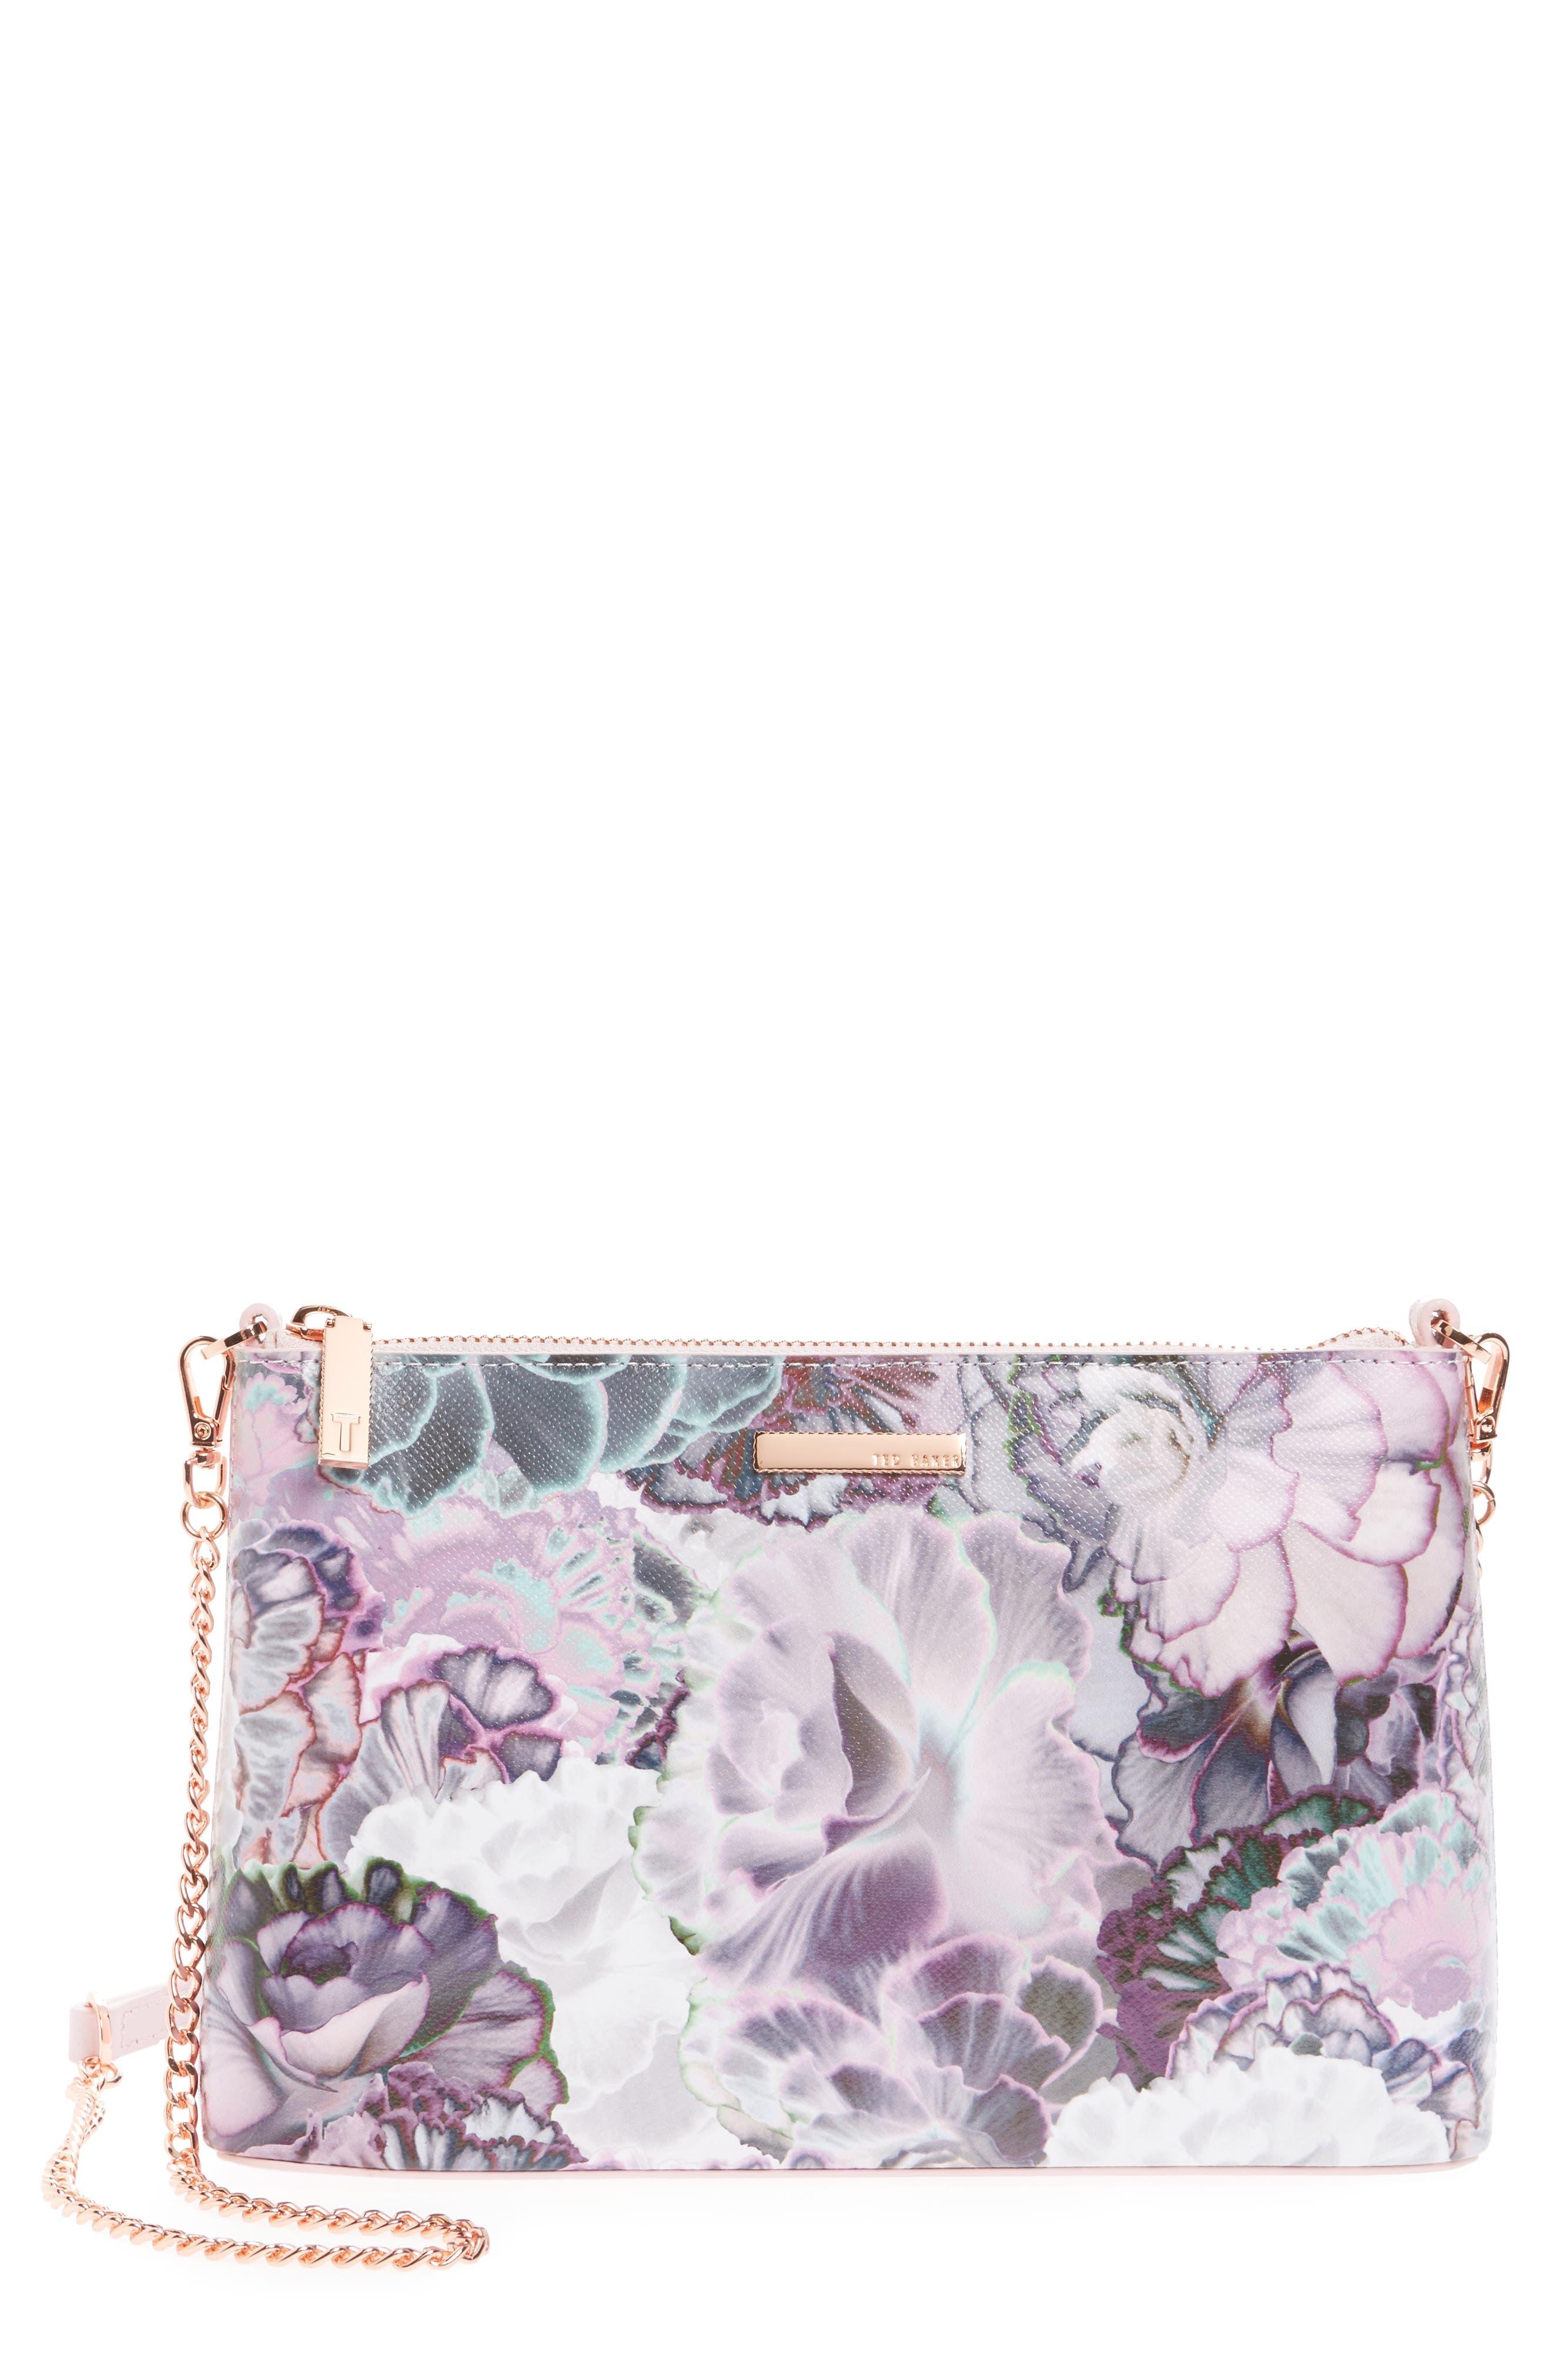 Main Image - Ted Baker London Illuminated Bloom Leather Crossbody Bag